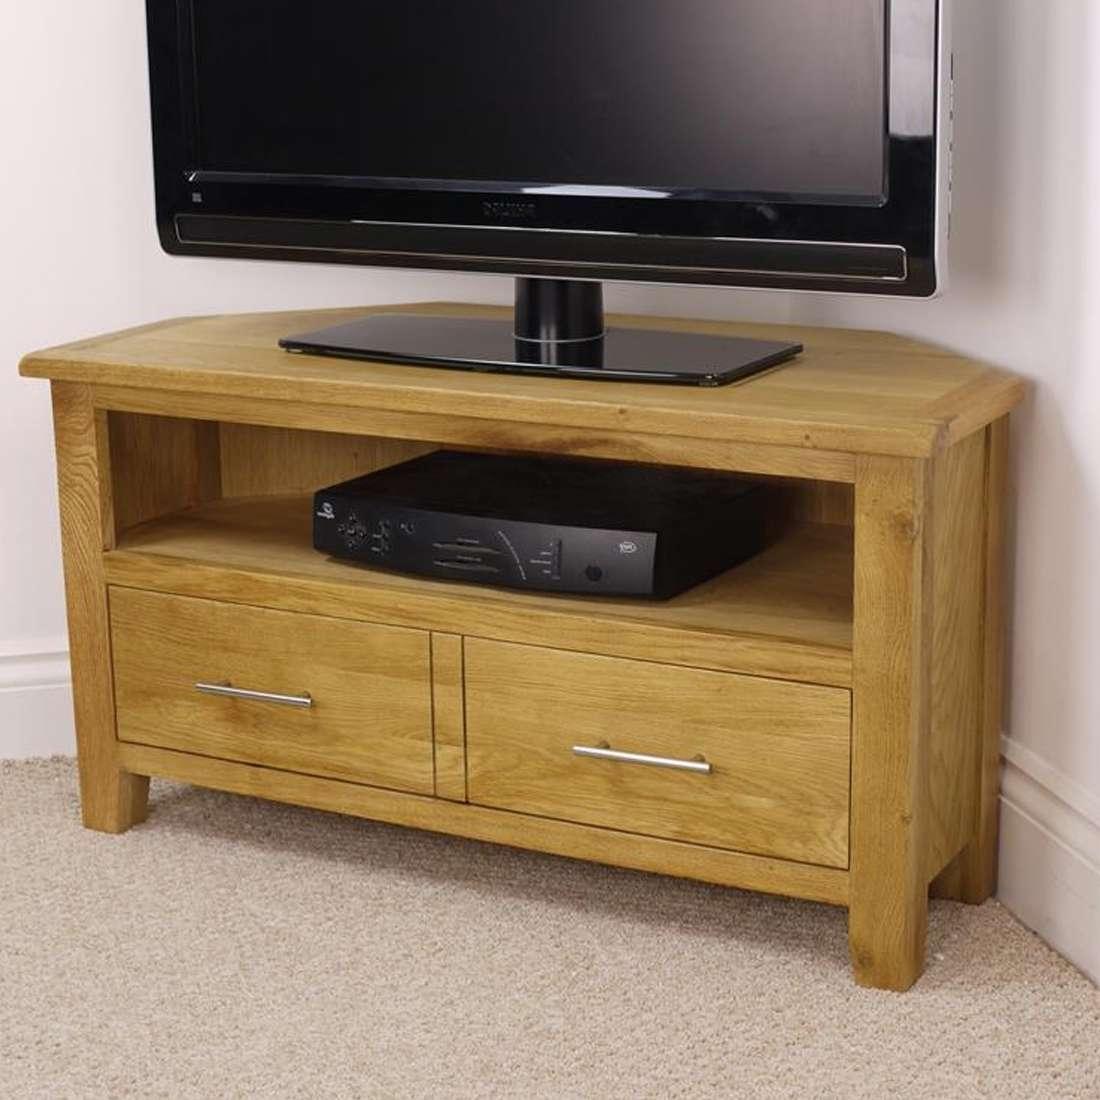 Nebraska Modern Oak Corner Tv Unit / Solid Wood Tv Stand / Oiled With Regard To Oak Corner Tv Cabinets (View 3 of 20)